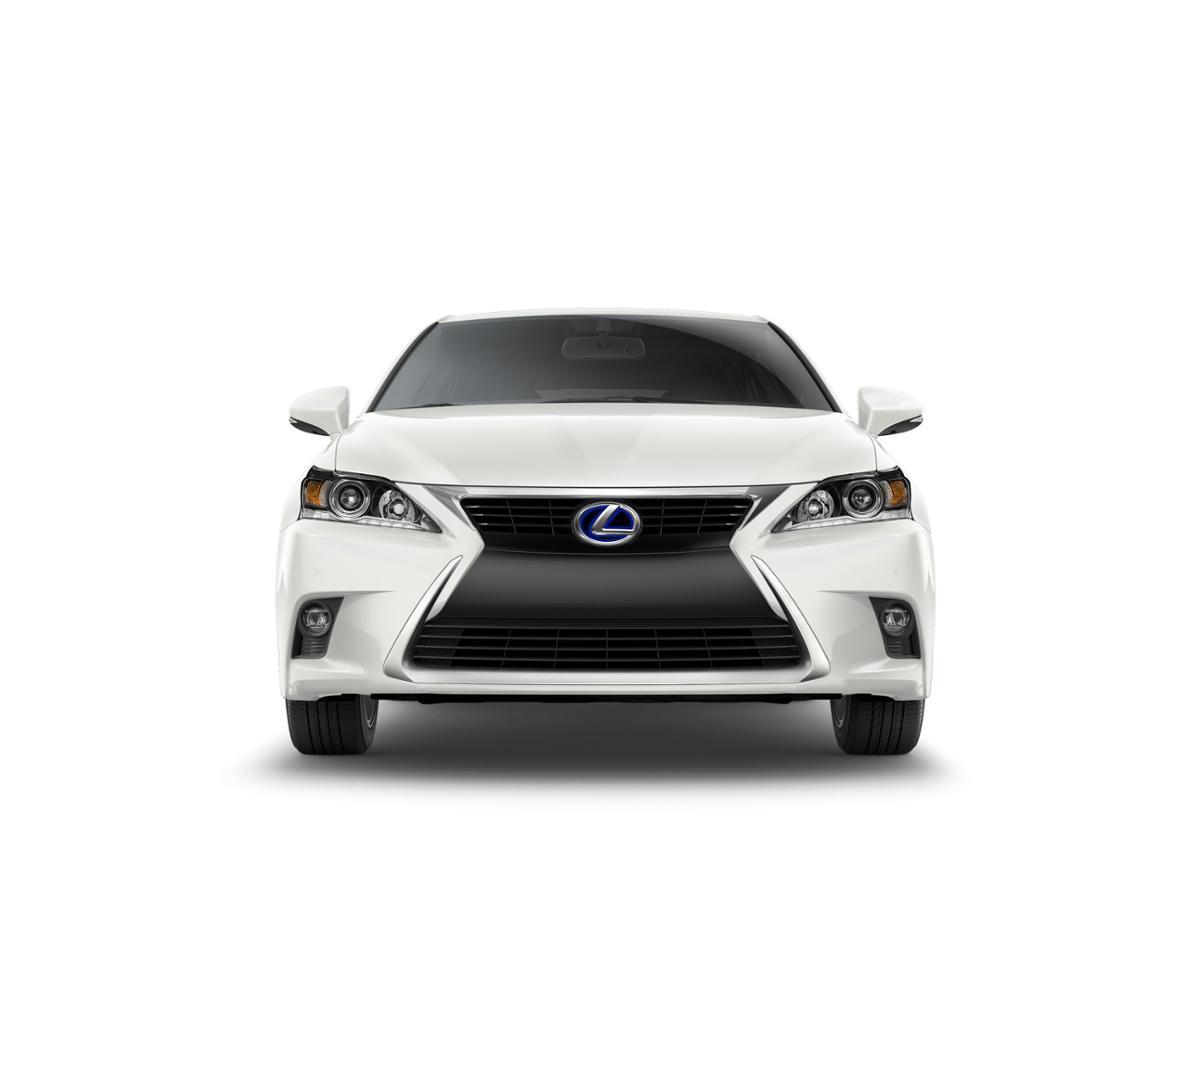 Lexus Dealerships In Ct: 2017 Lexus CT 200h For Sale In Roseville